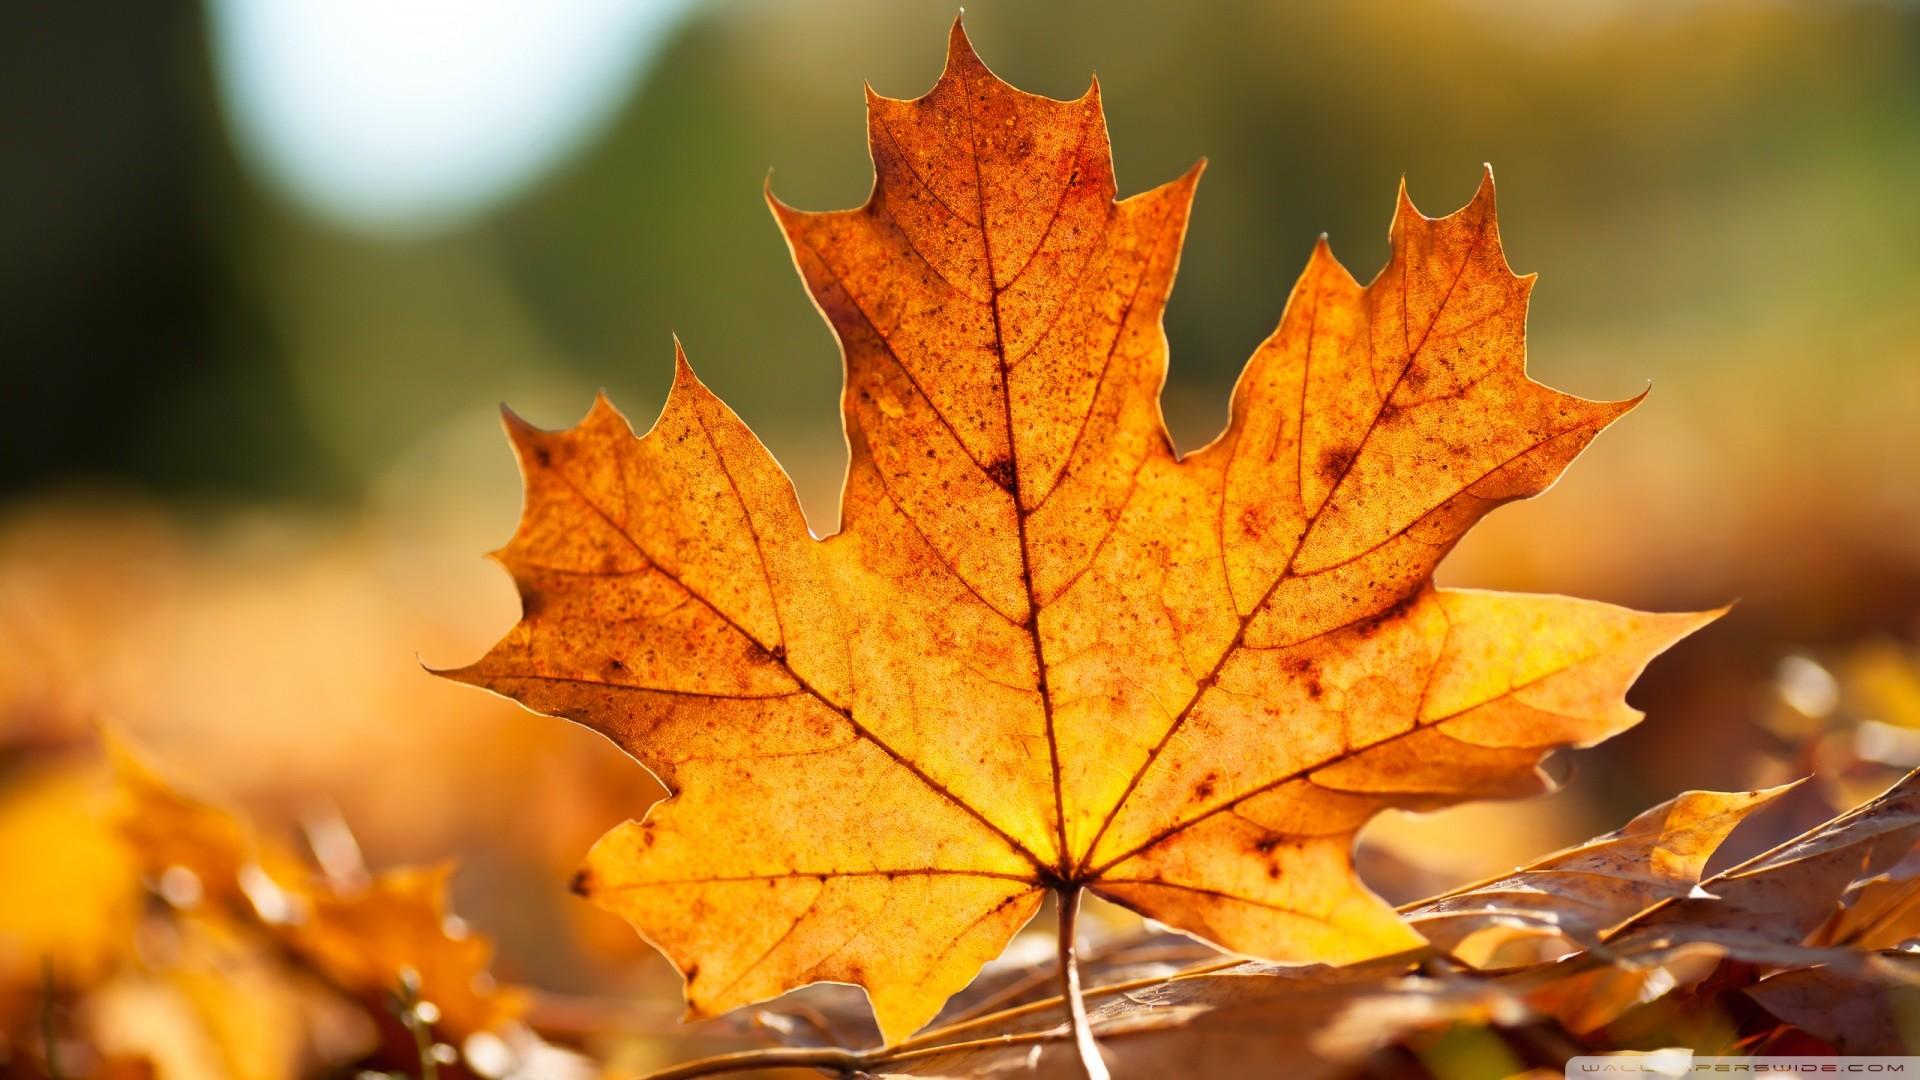 Res: 1920x1080, Autumn Leaf Wallpaper  Autumn Leaf